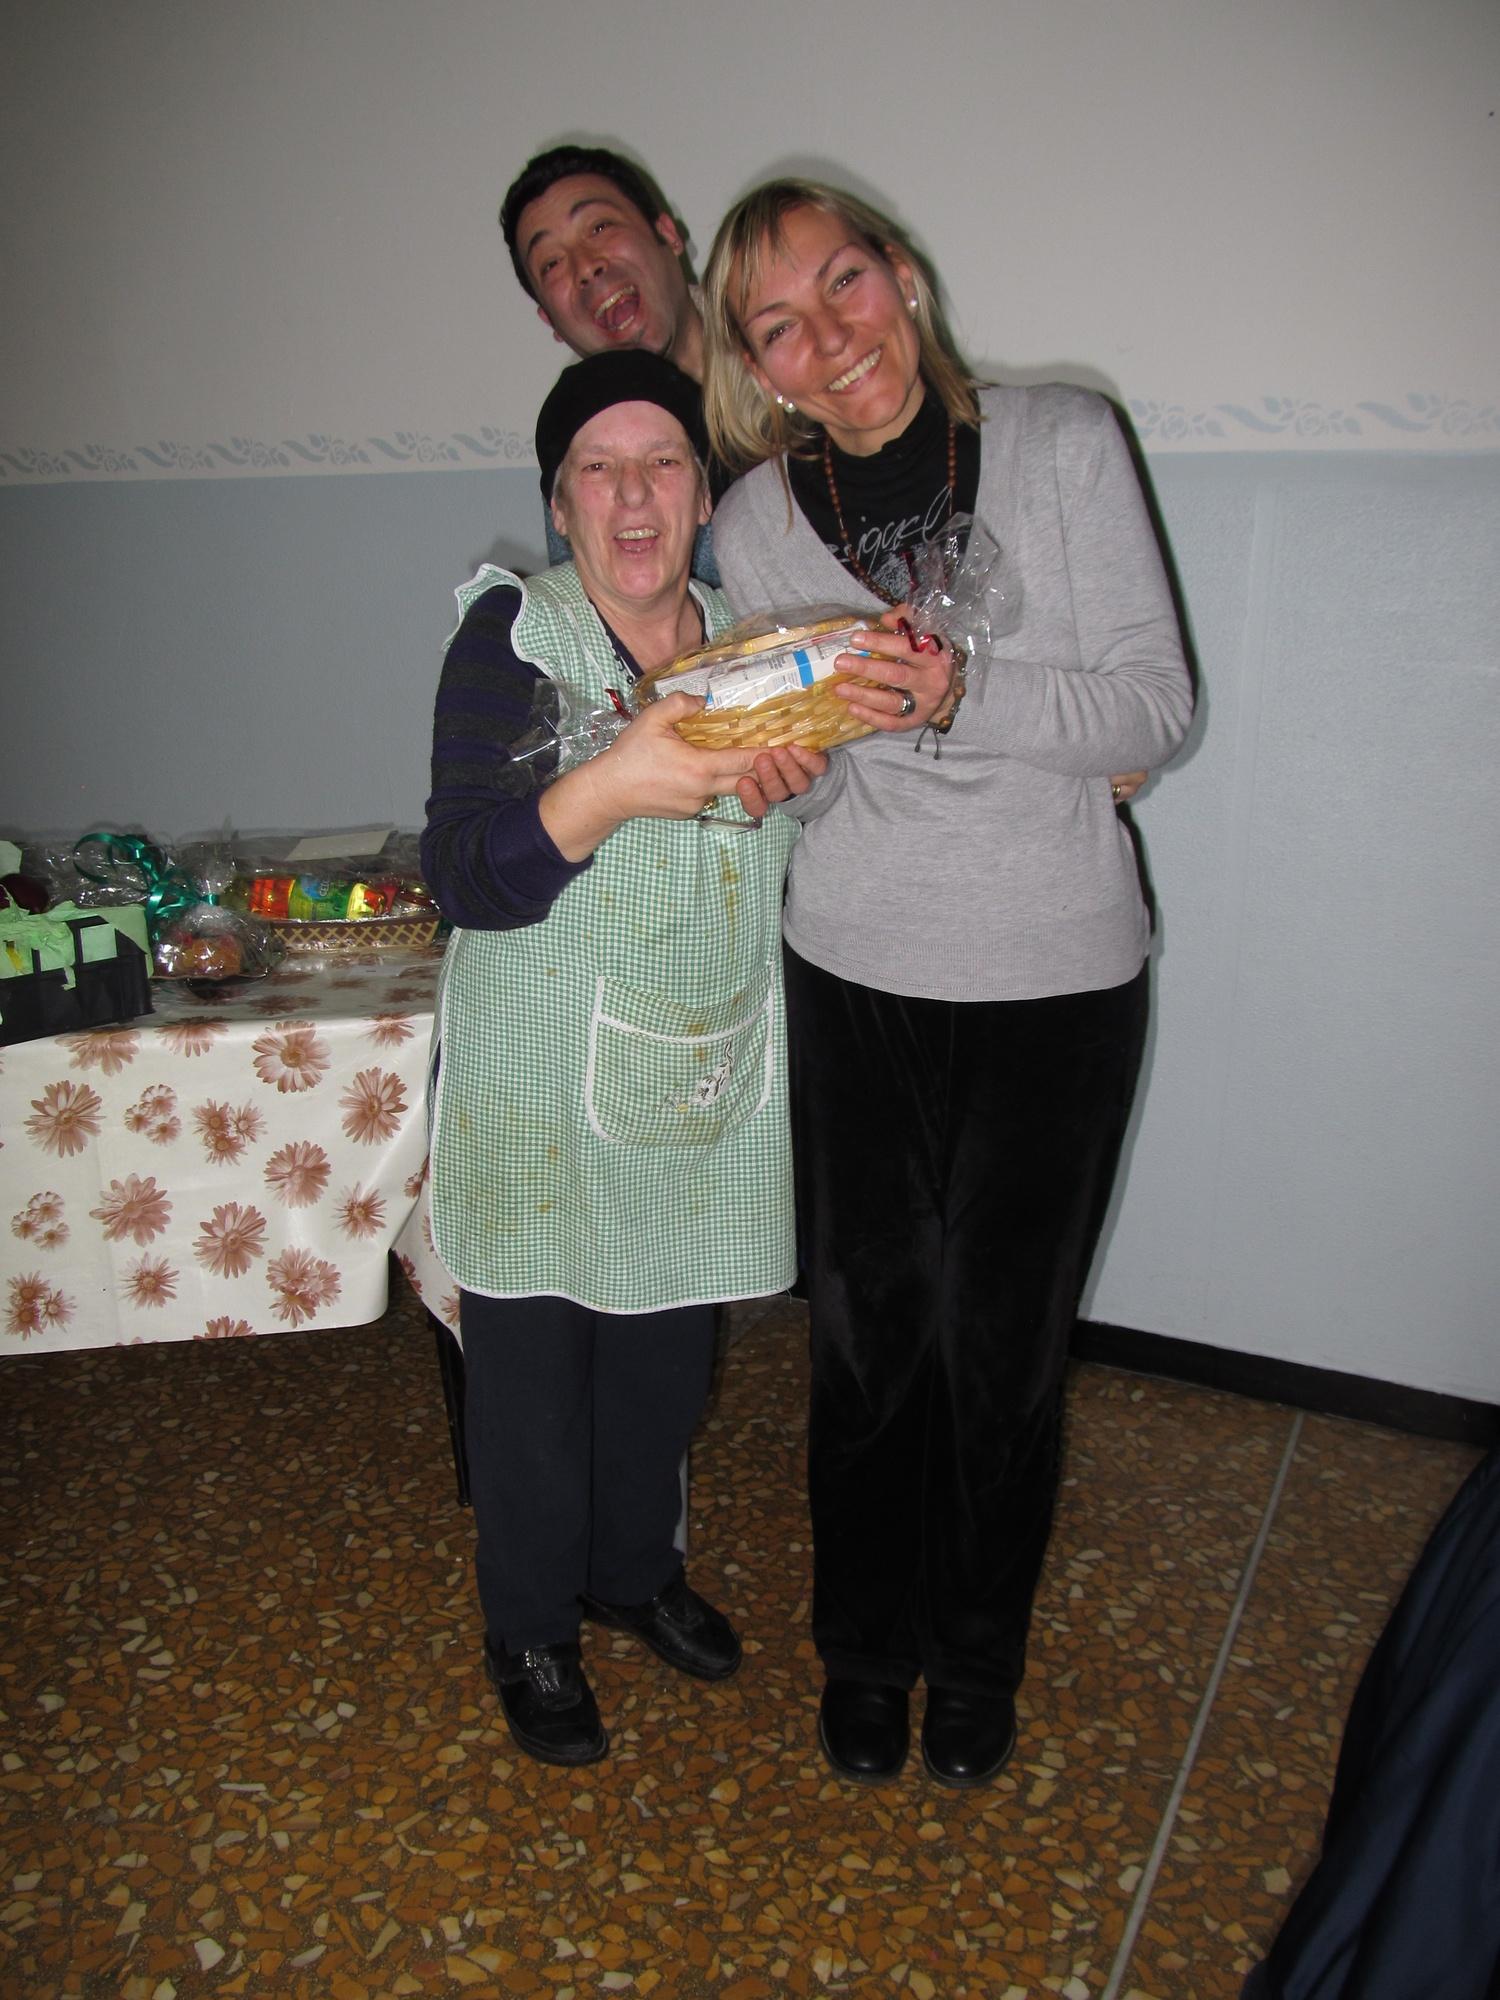 polentata-2016-02-20-21-52-23